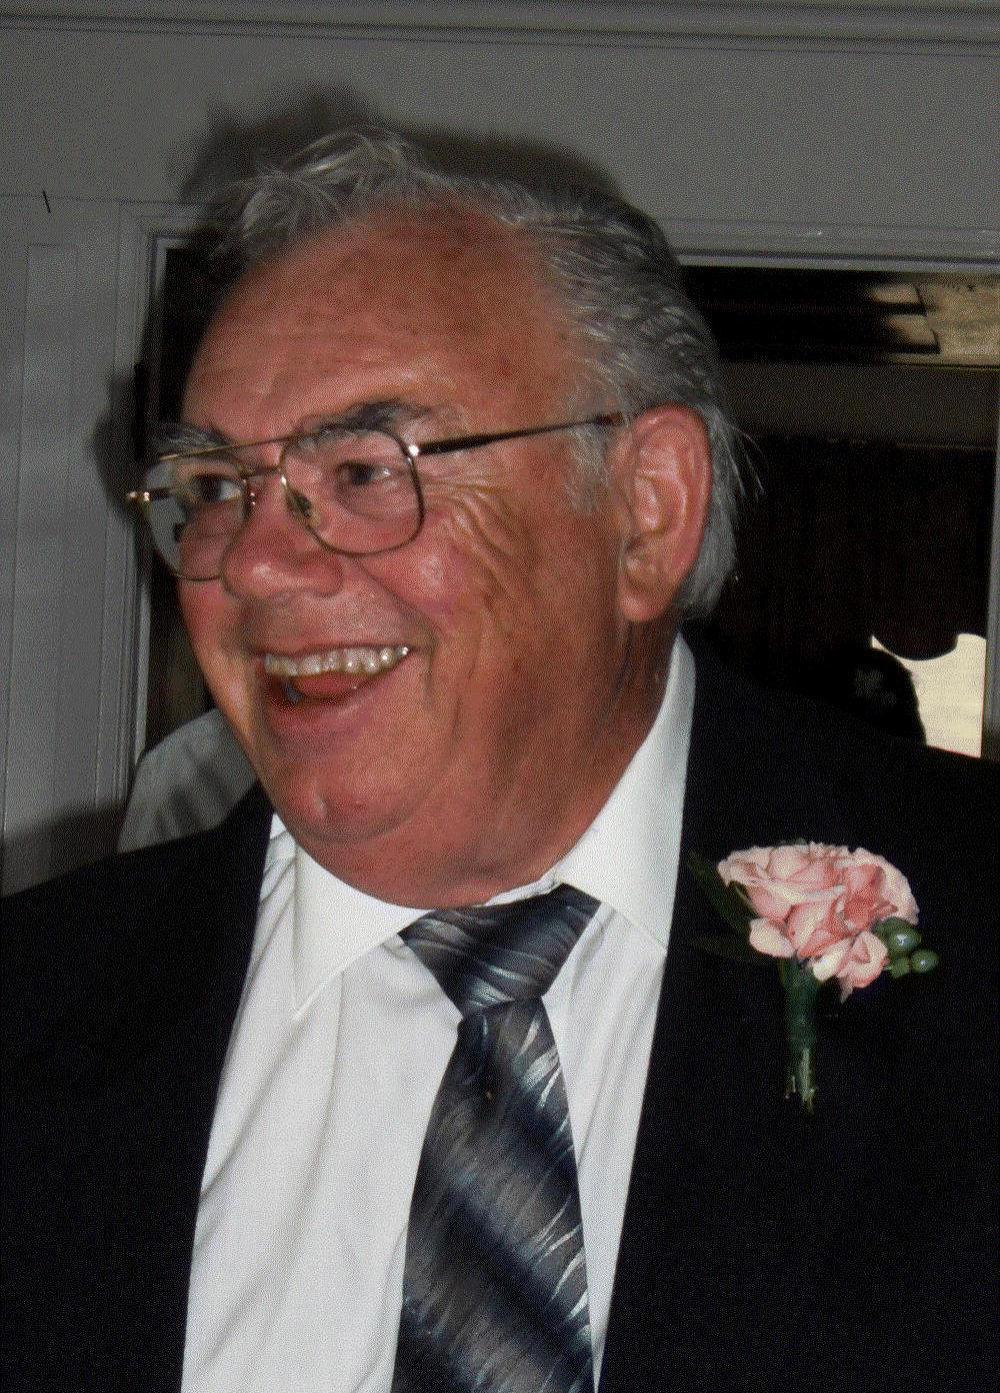 G. Edward Knisely